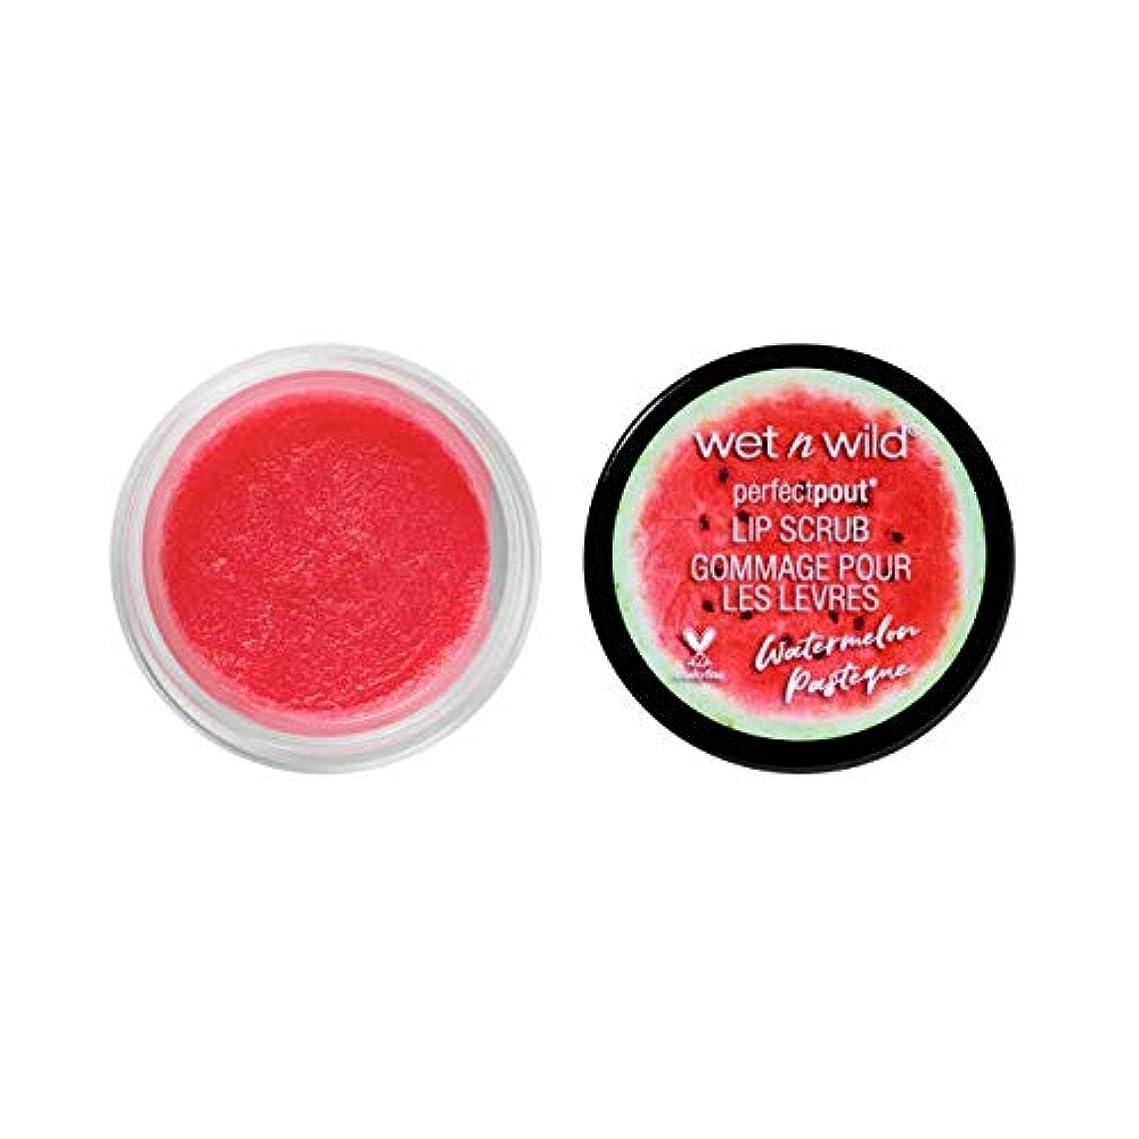 消す注入者WET N WILD Lip Scrub - Watermelon (6 Pack) (並行輸入品)